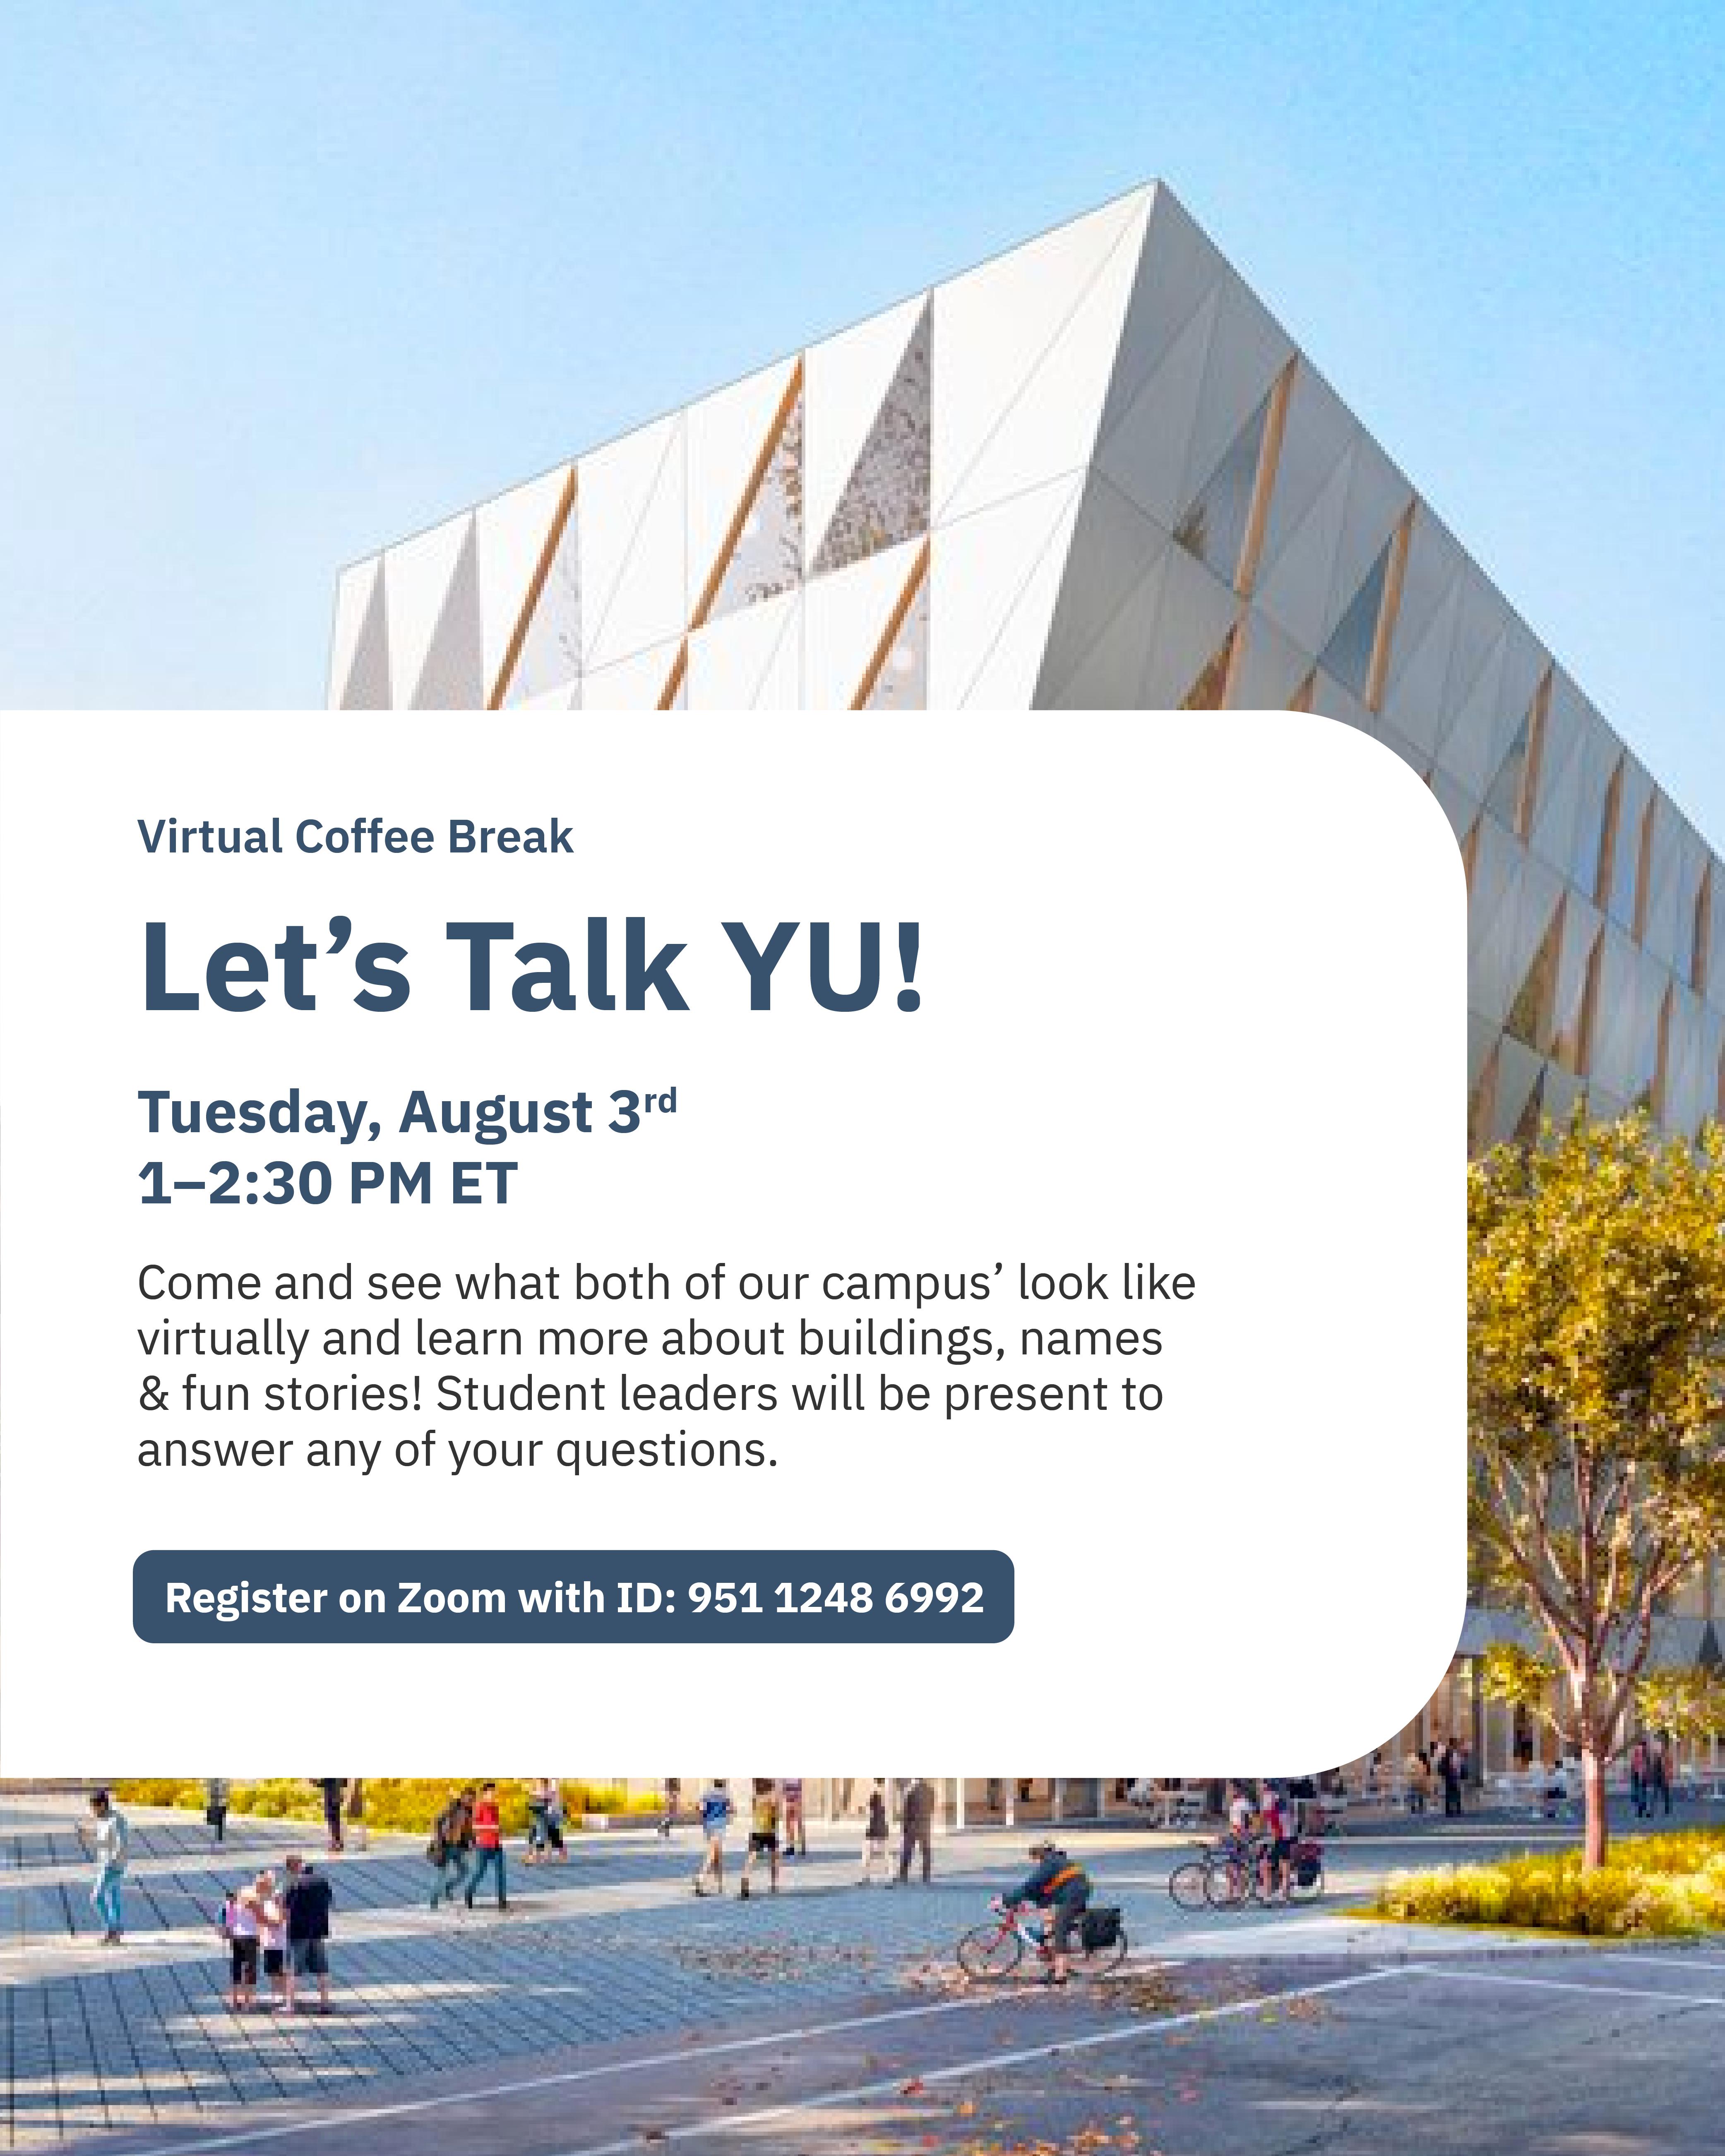 Virtual Coffee Break: Let's Talk YU @ Zoom - York International